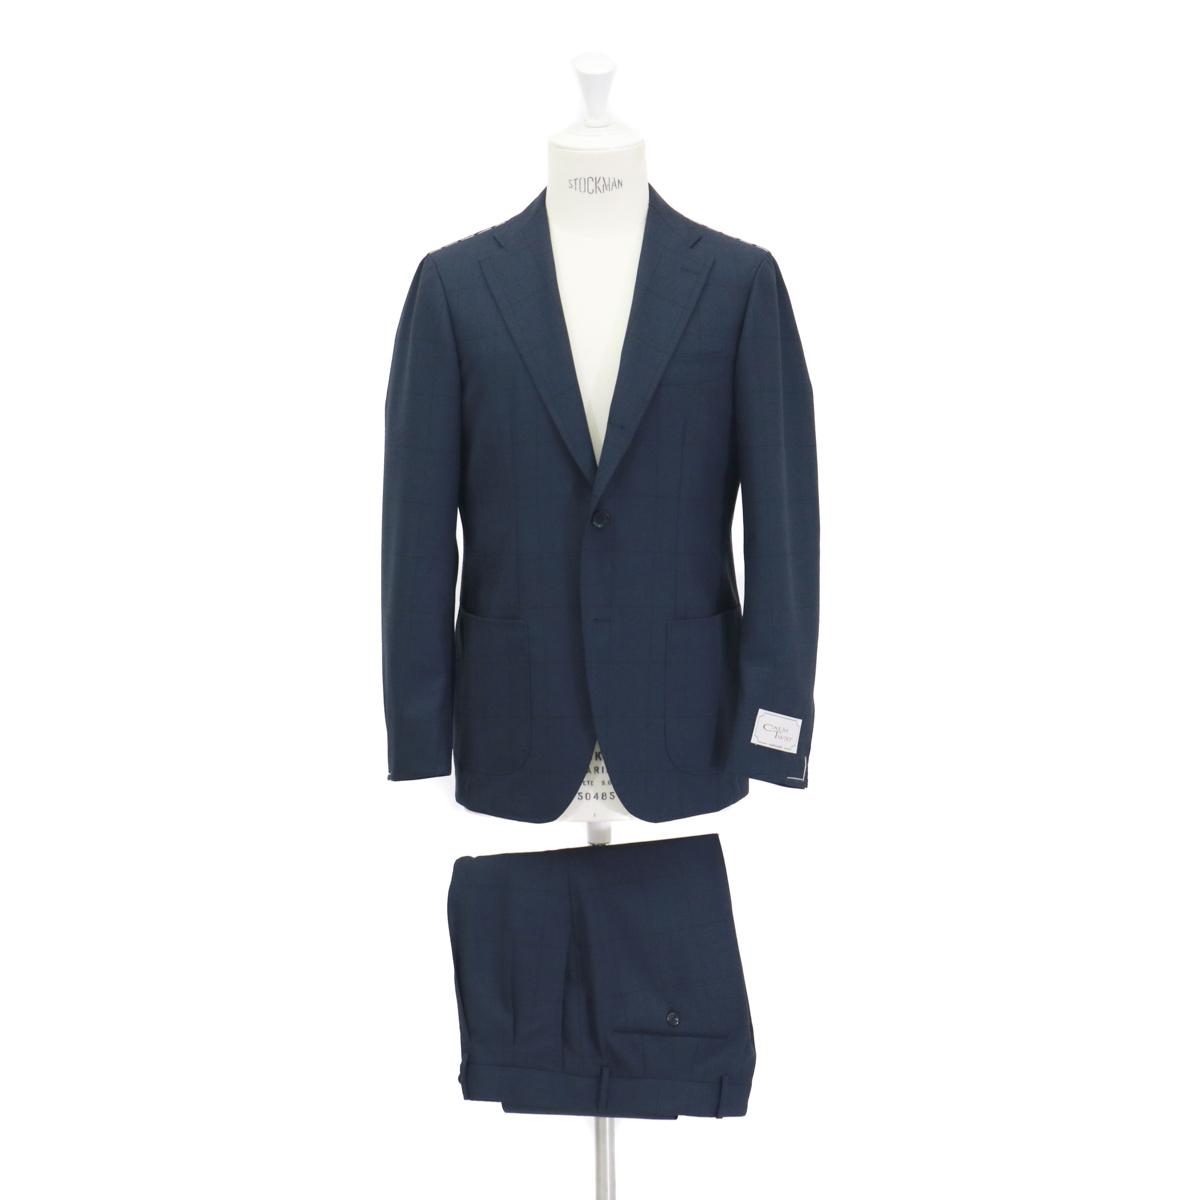 RING JACKET リングヂャケットModel No-278F S-178CALM TWIST3Bスーツ【ネイビー】